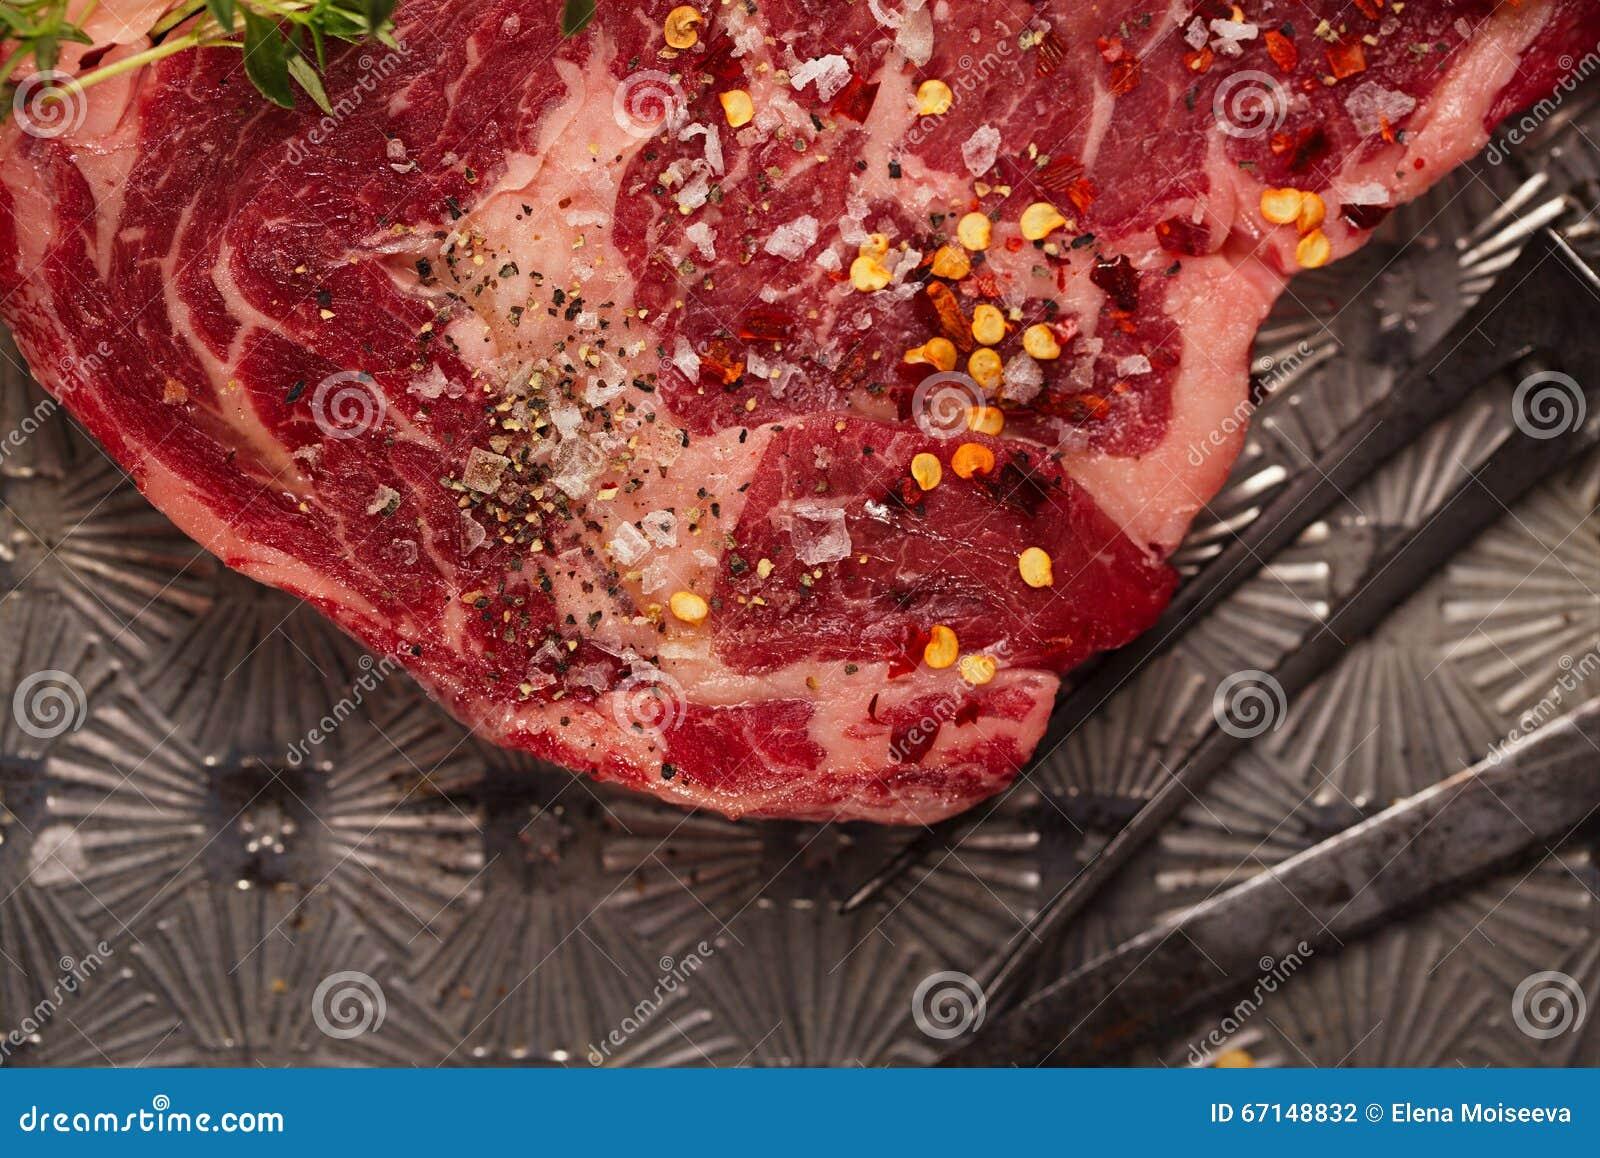 Beef steak t-bone with vintage meat fork